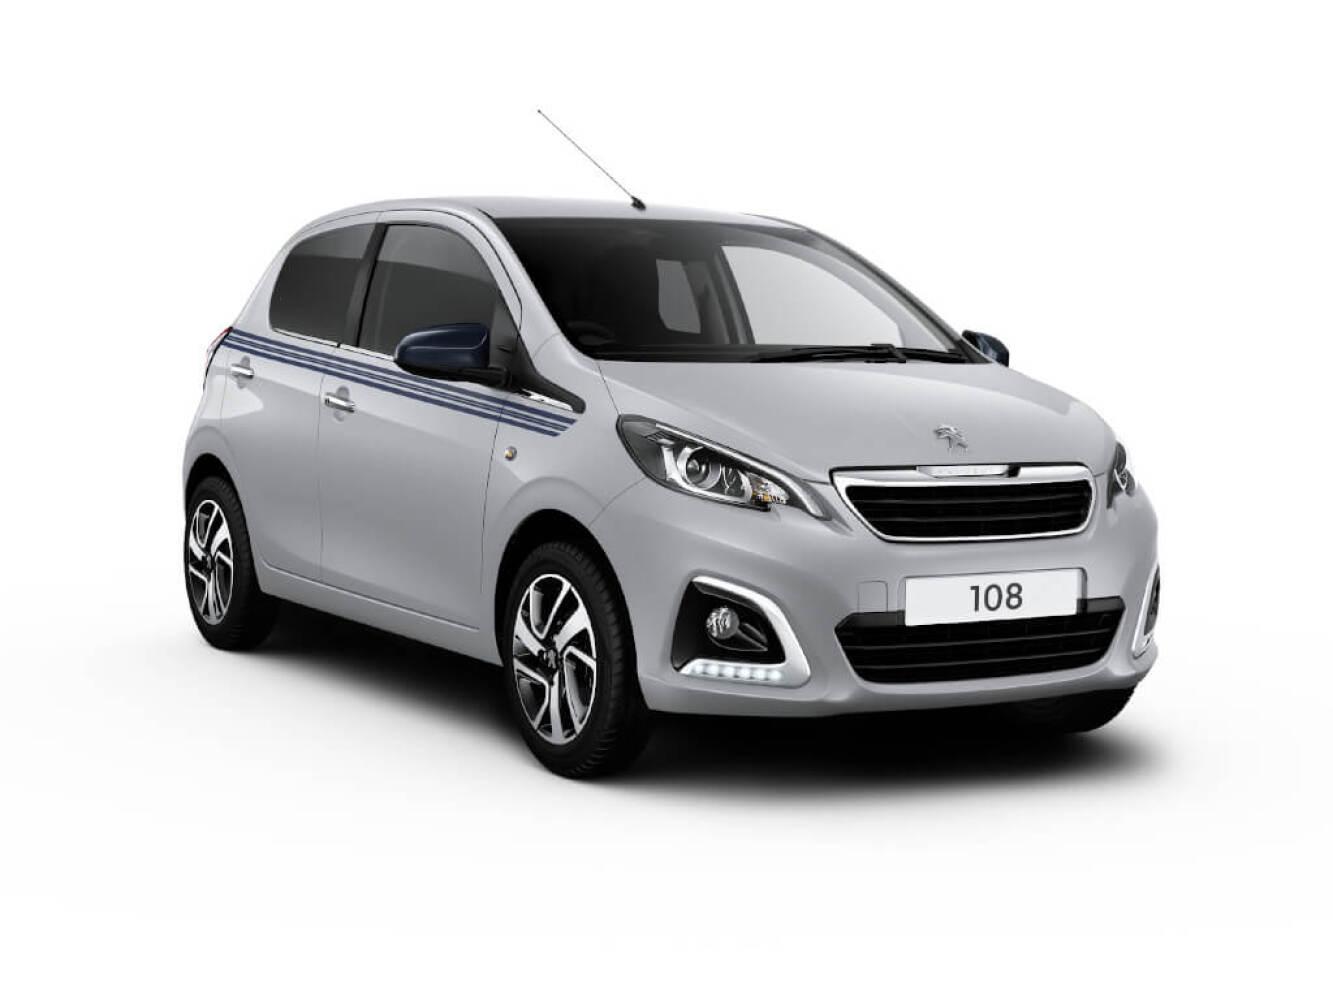 New Peugeot 108 1.0 72 Collection 5dr Petrol Hatchback For